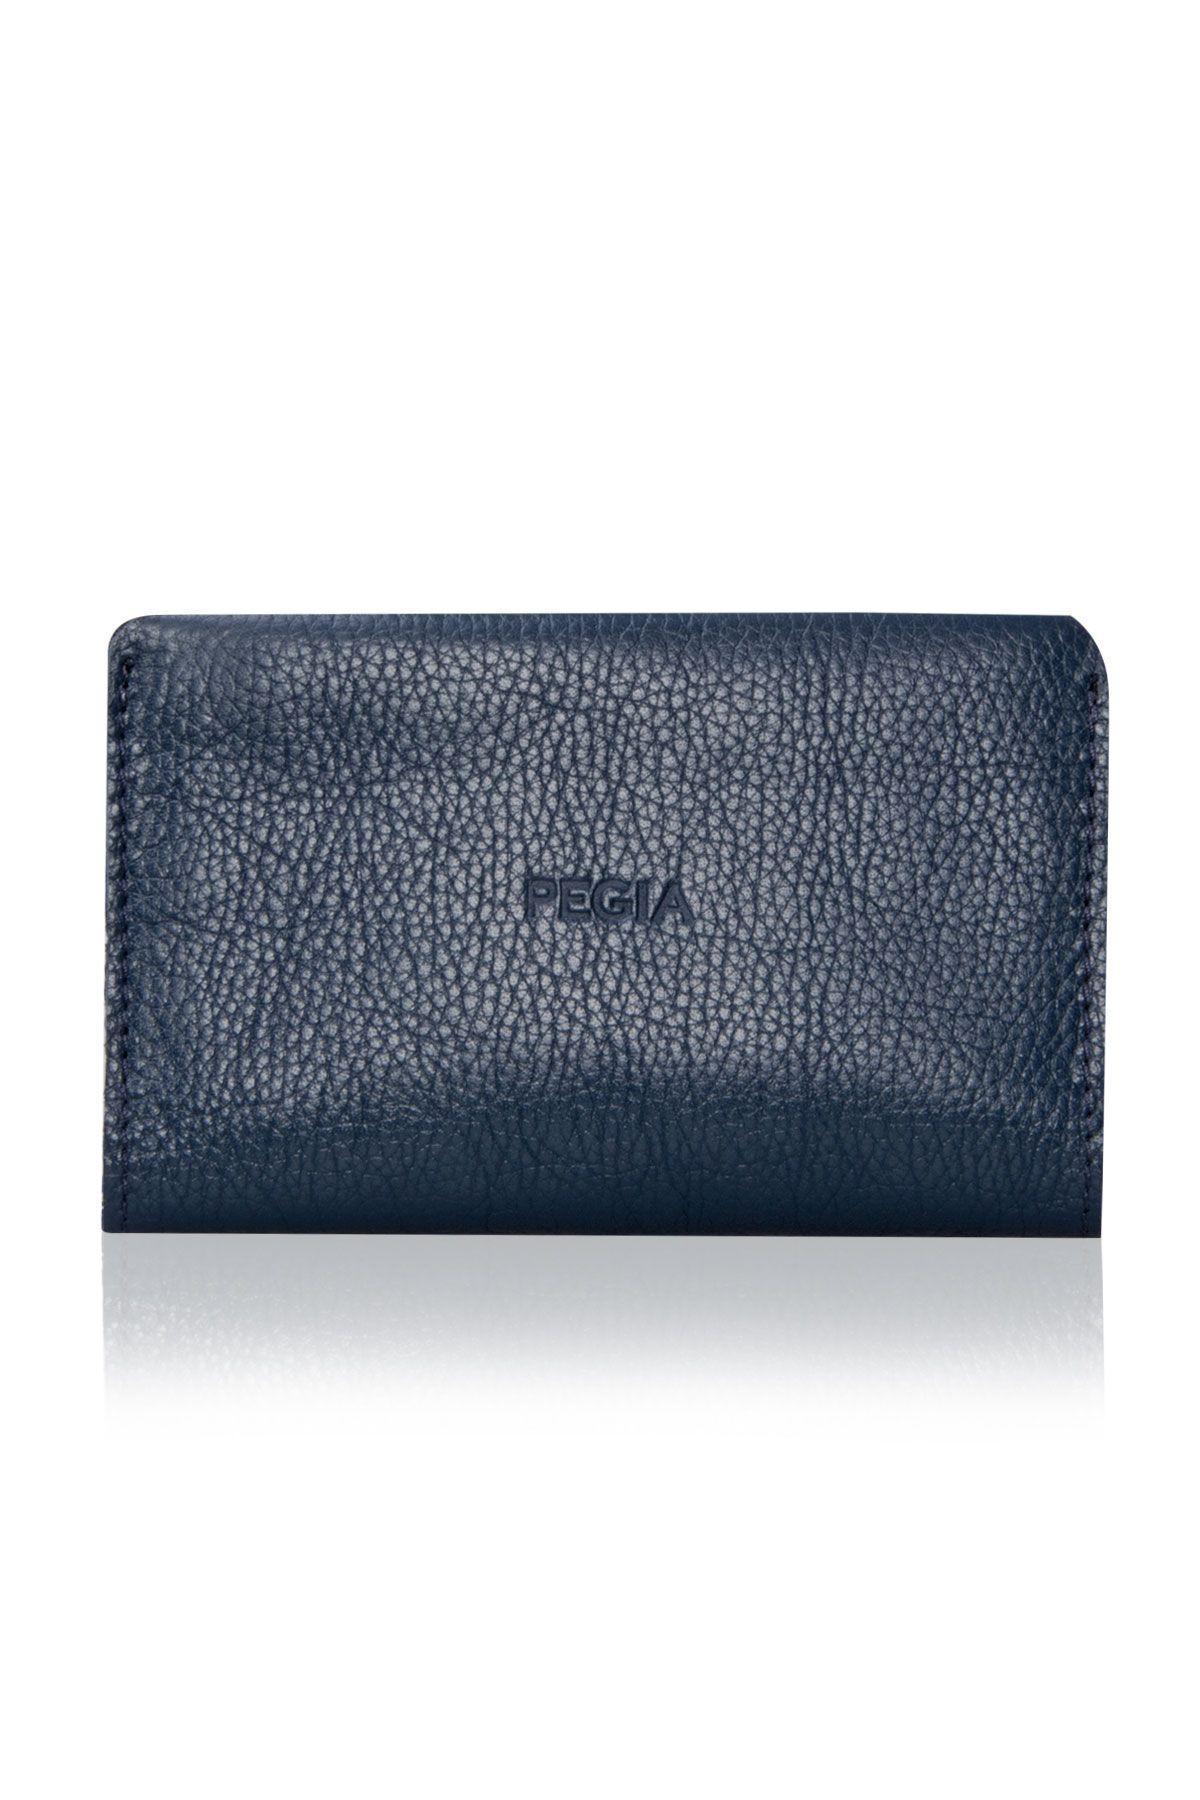 Pegia Genuine Leather Big Size Wallet 19CZ300 Navy blue